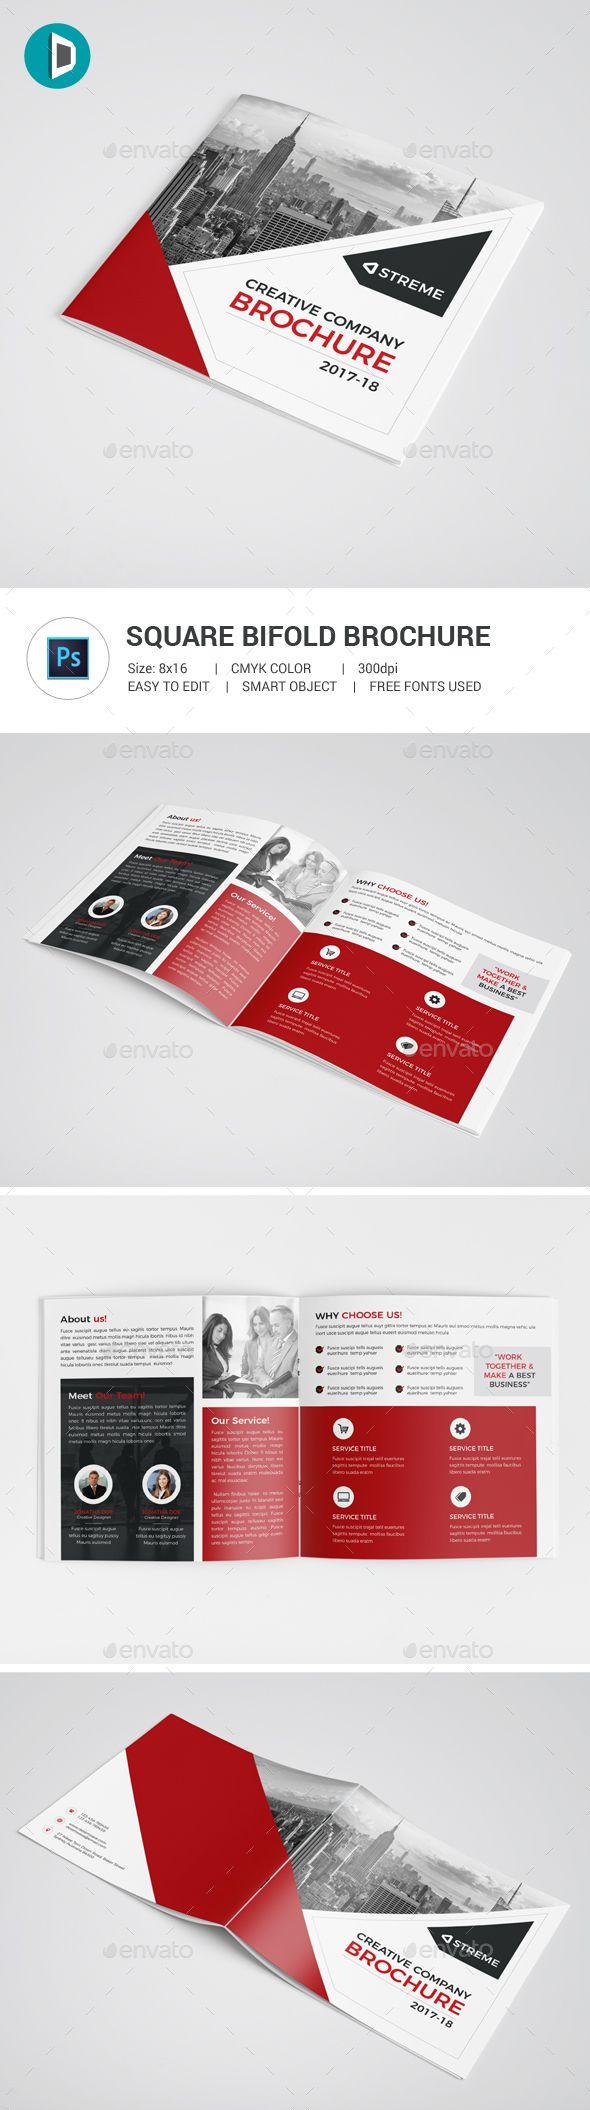 Square Bifold Brochure Template PSD